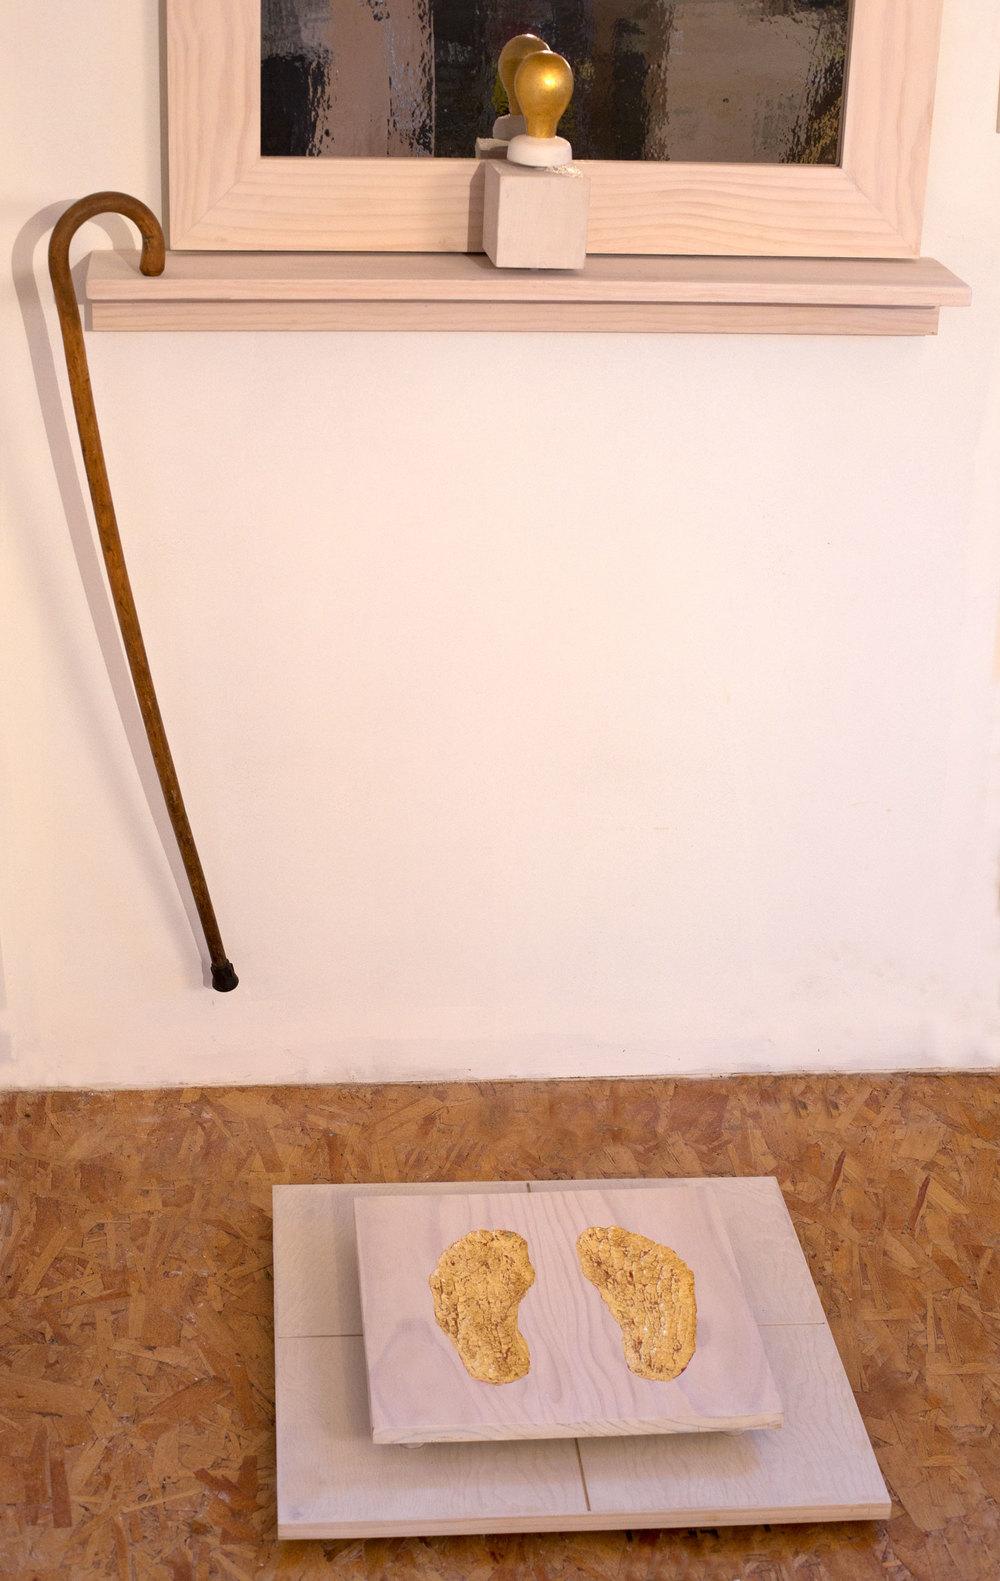 """Possible Self-Portrait"" (detail), 74"" h x 36"" w x 32"" d, wood, mylar, gold leaf, paint, found object; ©Tom Gormally 2015"